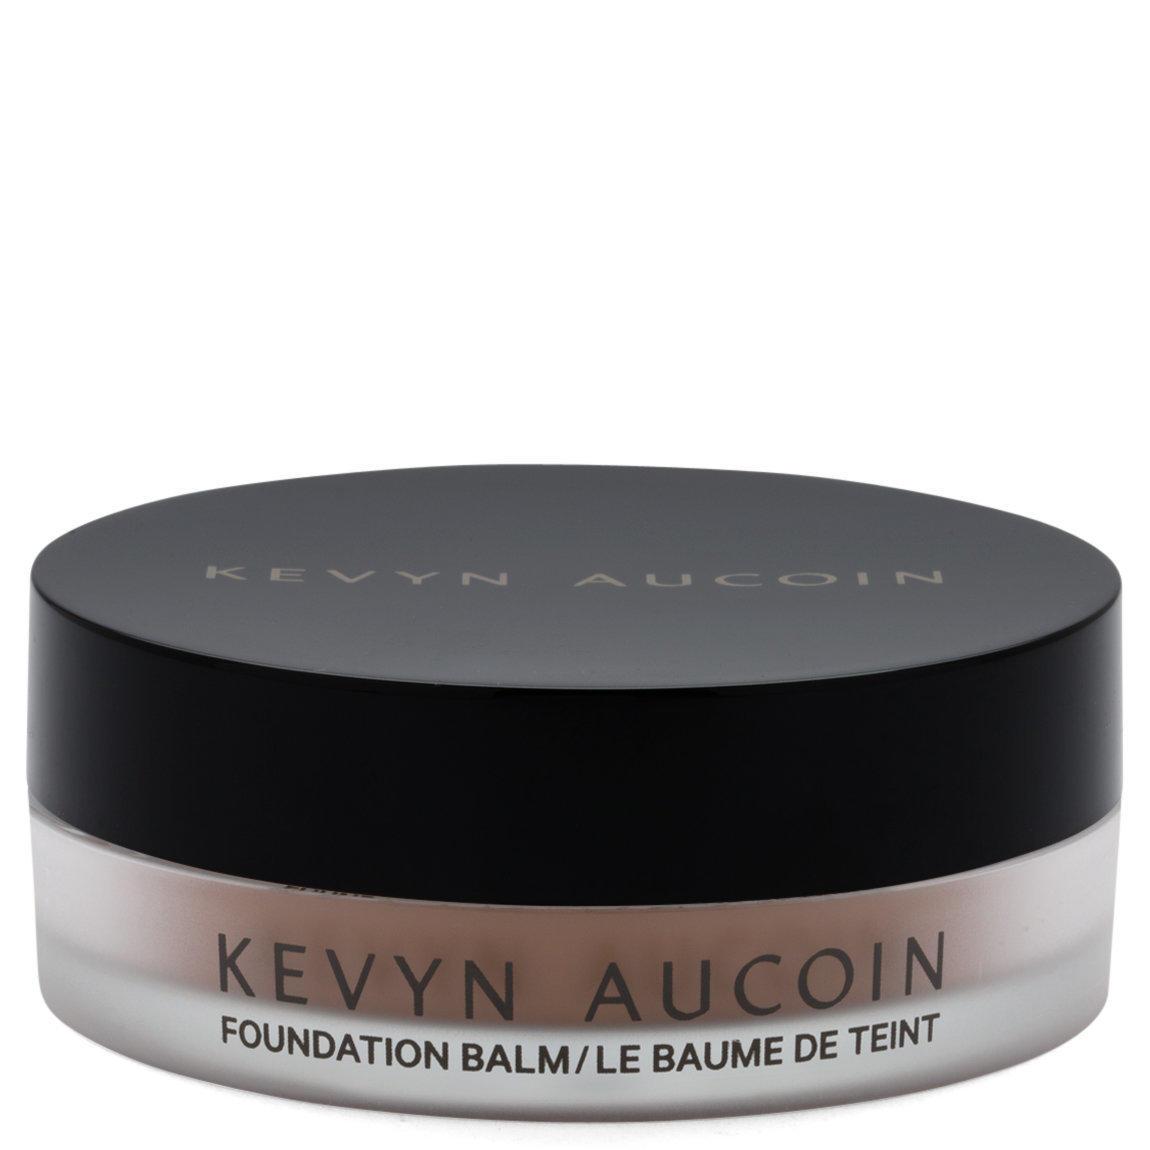 Kevyn Aucoin Foundation Balm Deep FB15